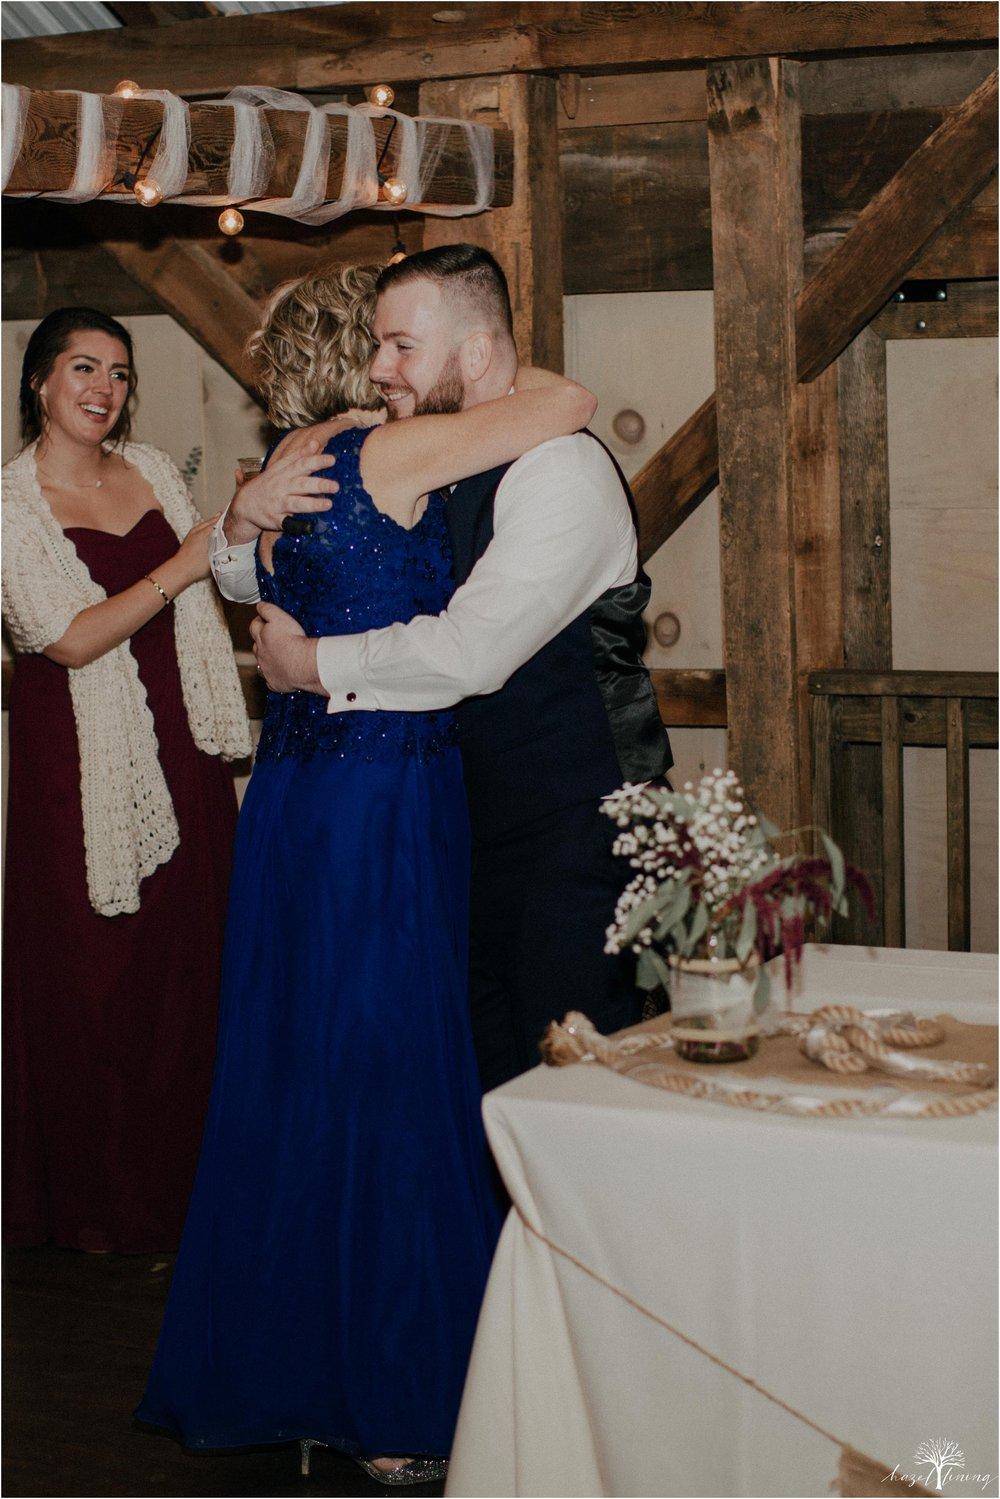 briana-krans-greg-johnston-farm-bakery-and-events-fall-wedding_0152.jpg